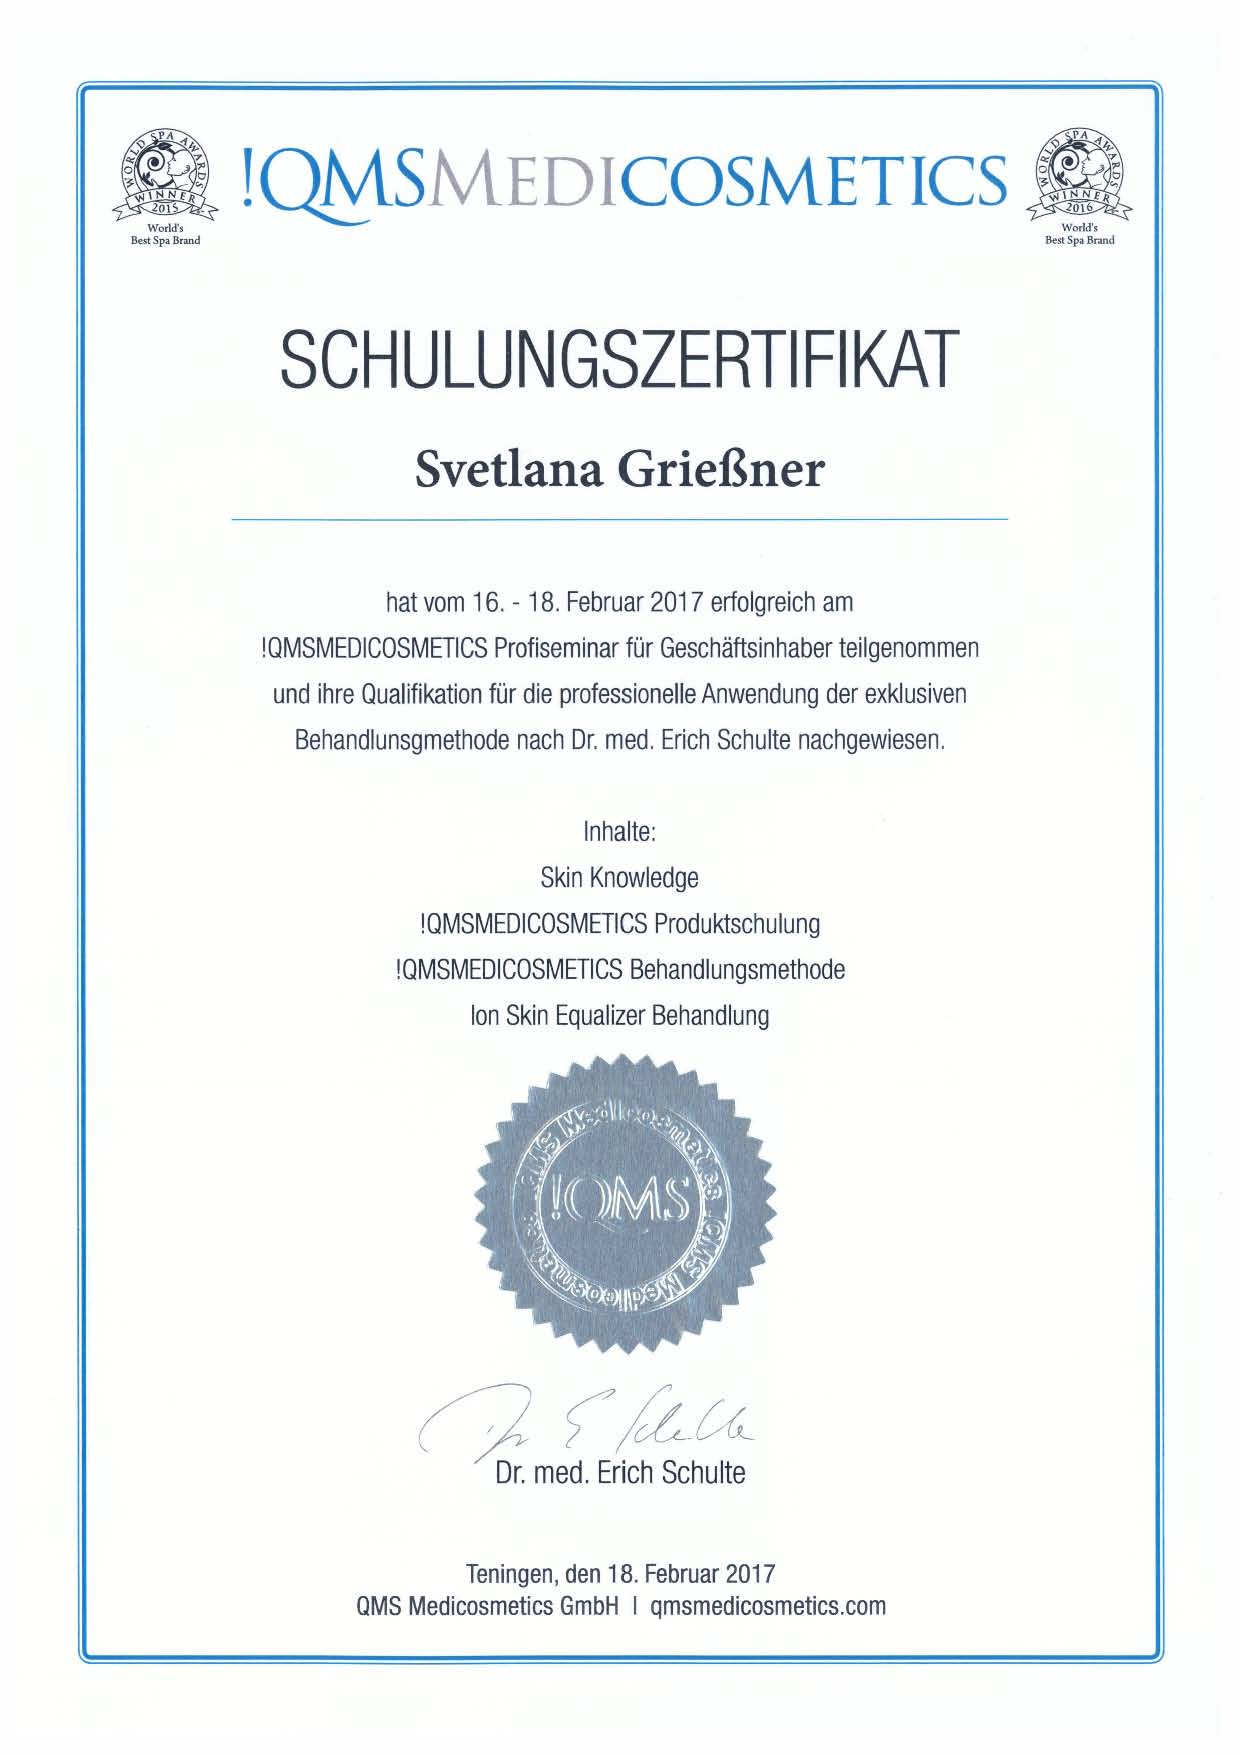 QMS MEDICOSMETICS Schulungszertifikat